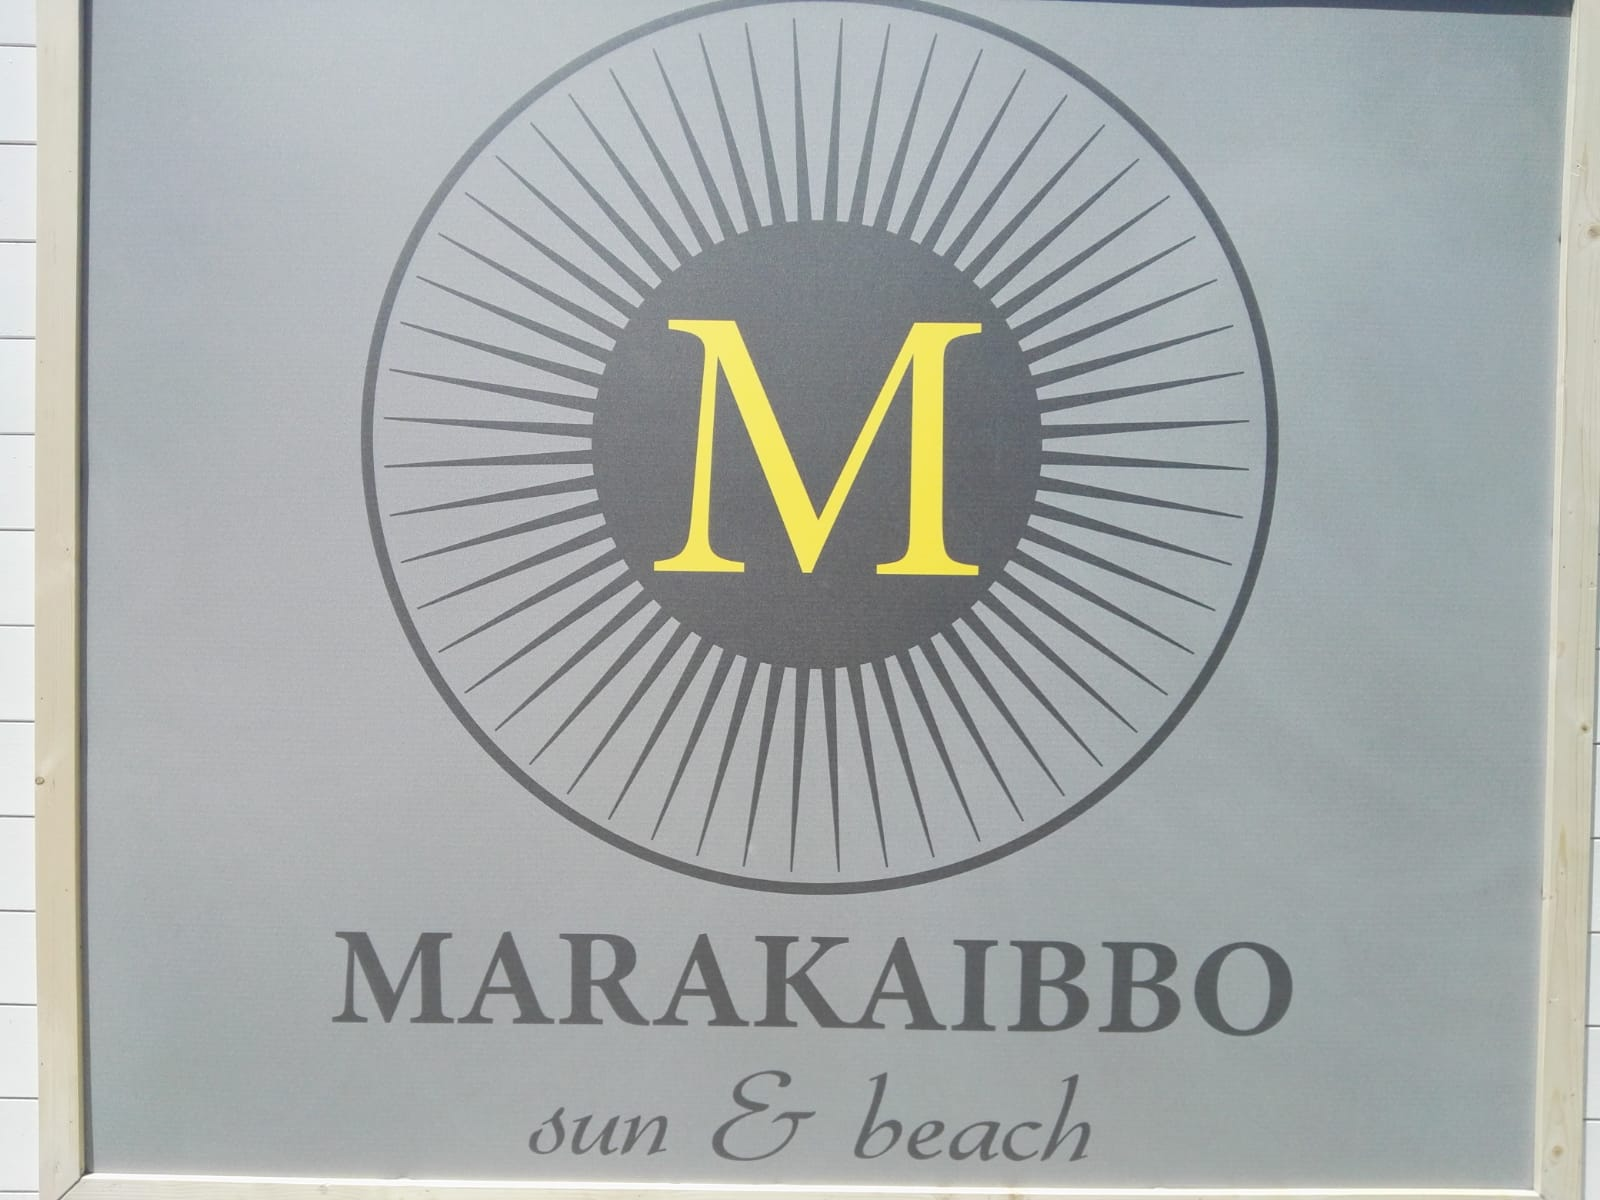 Lido Marakaibbo